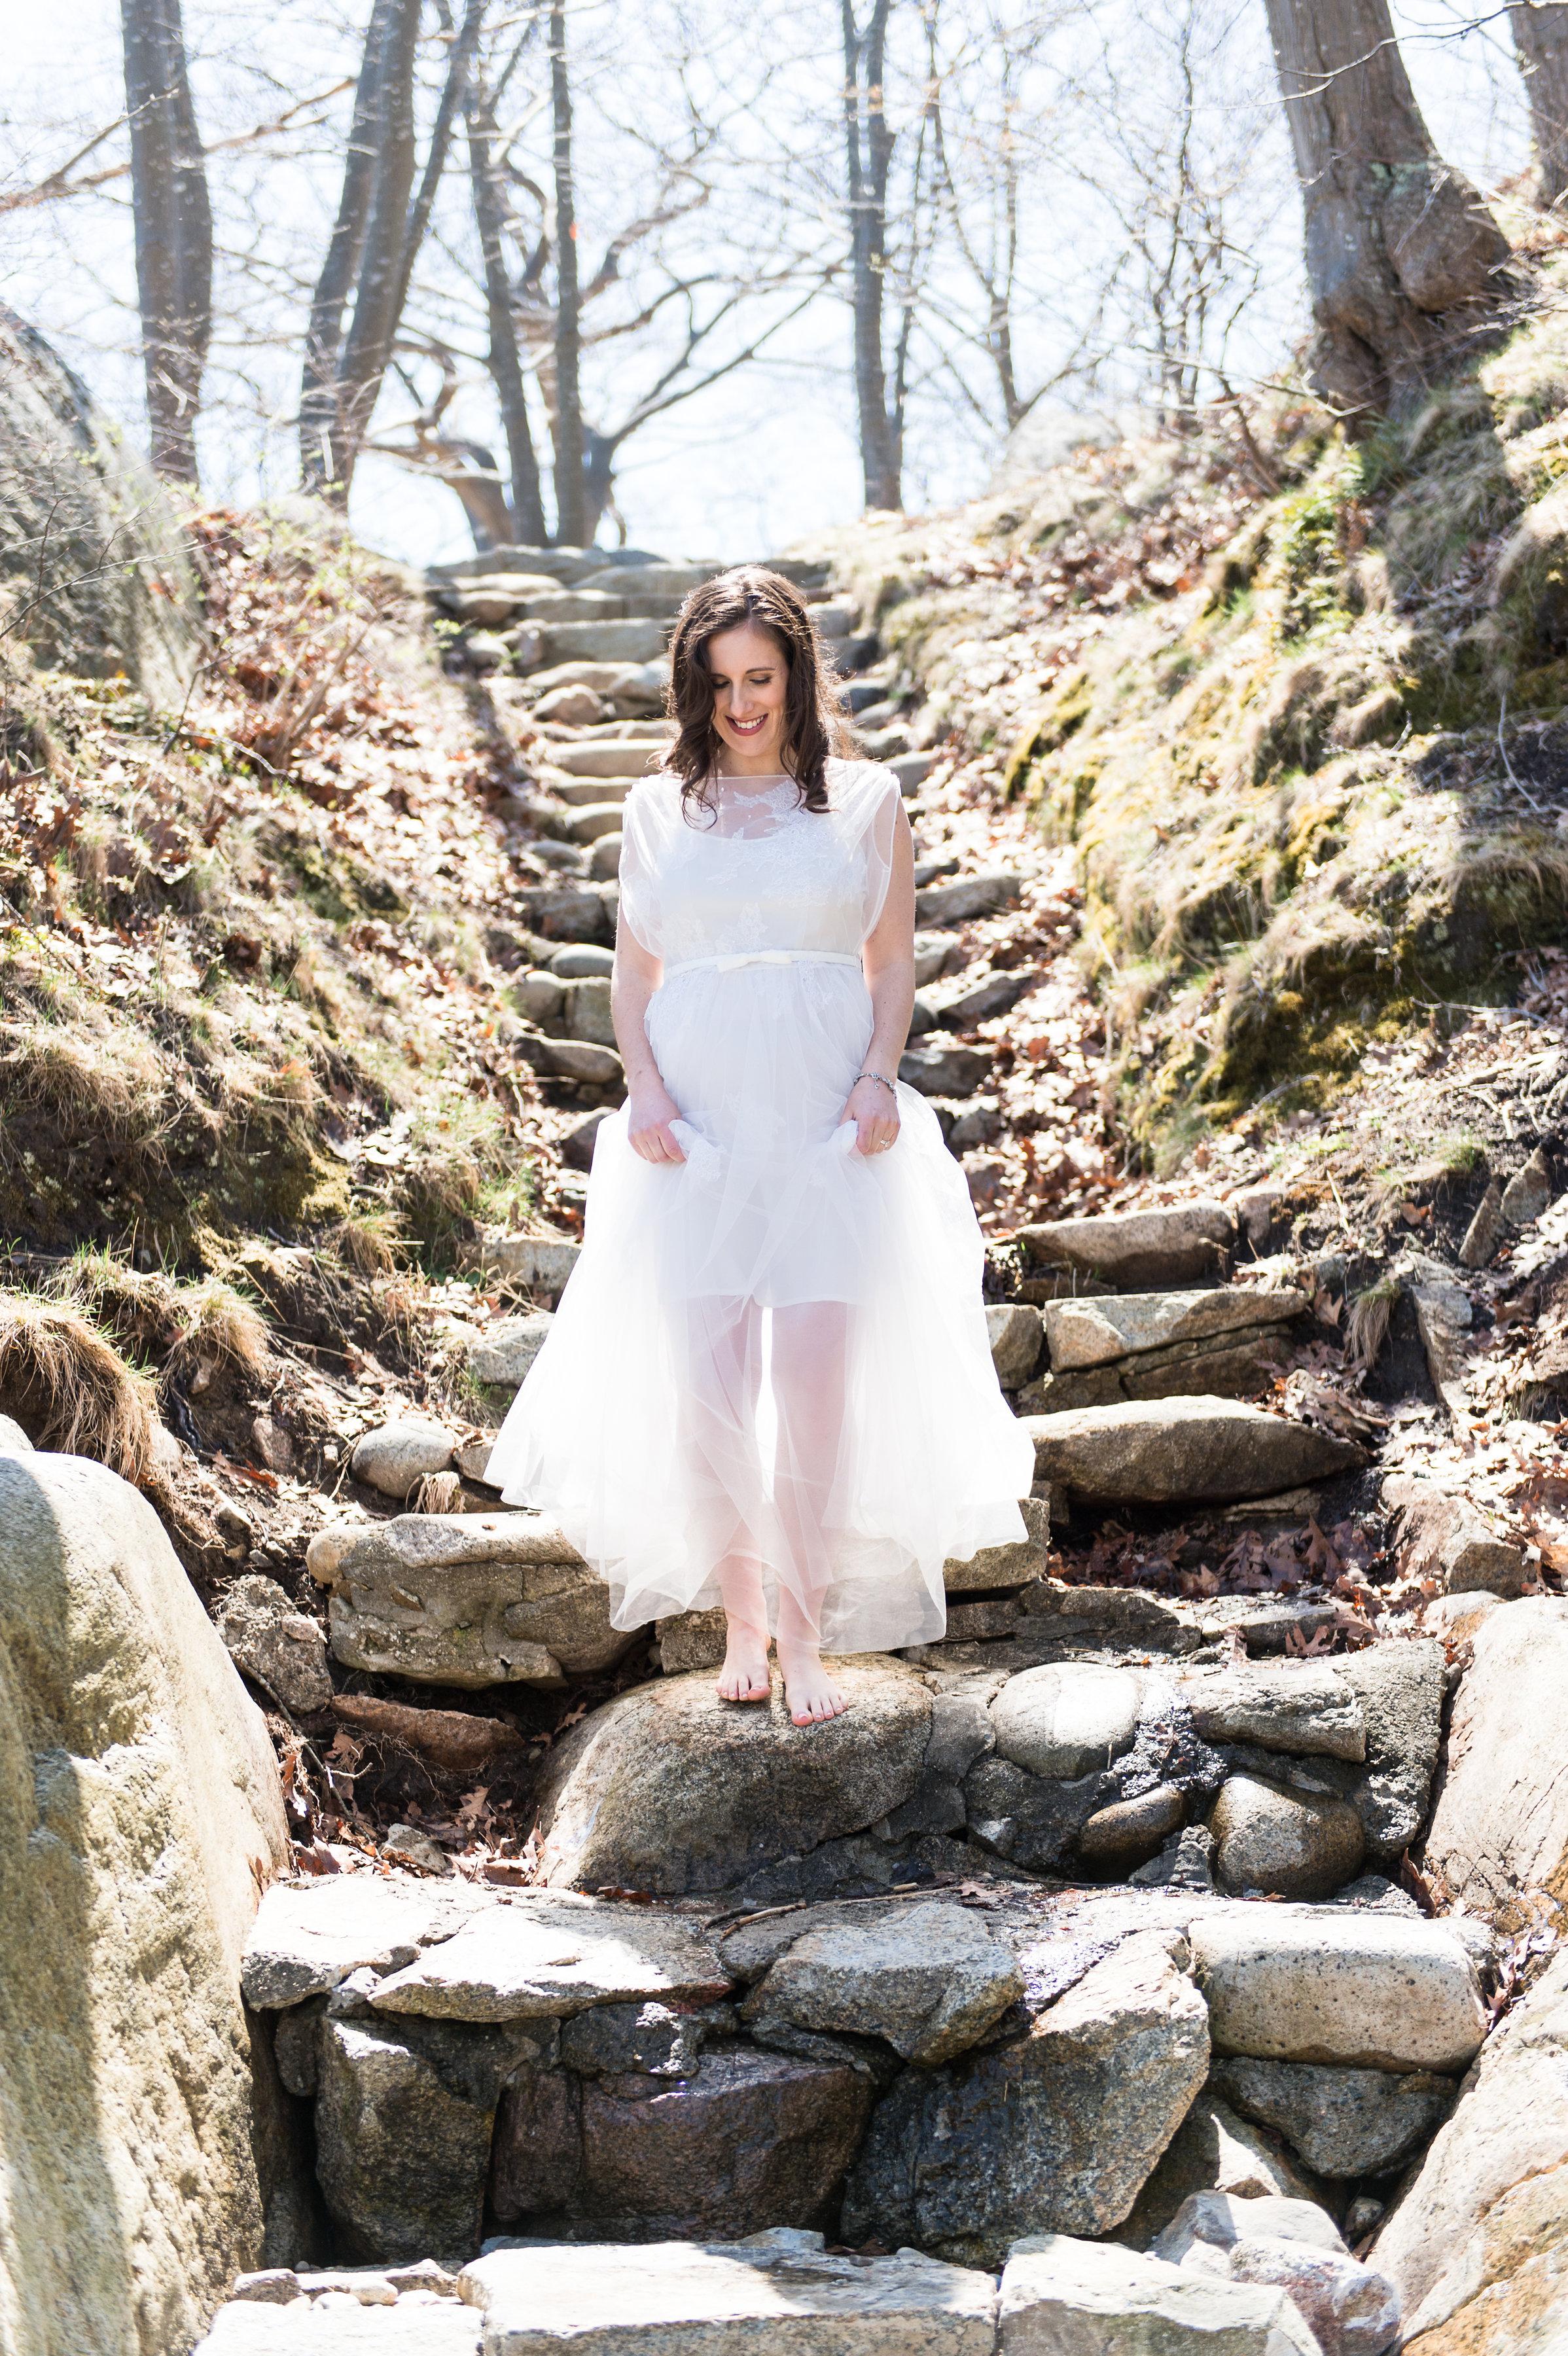 fun unique two piece wedding dress with shorter slip dress playful bride